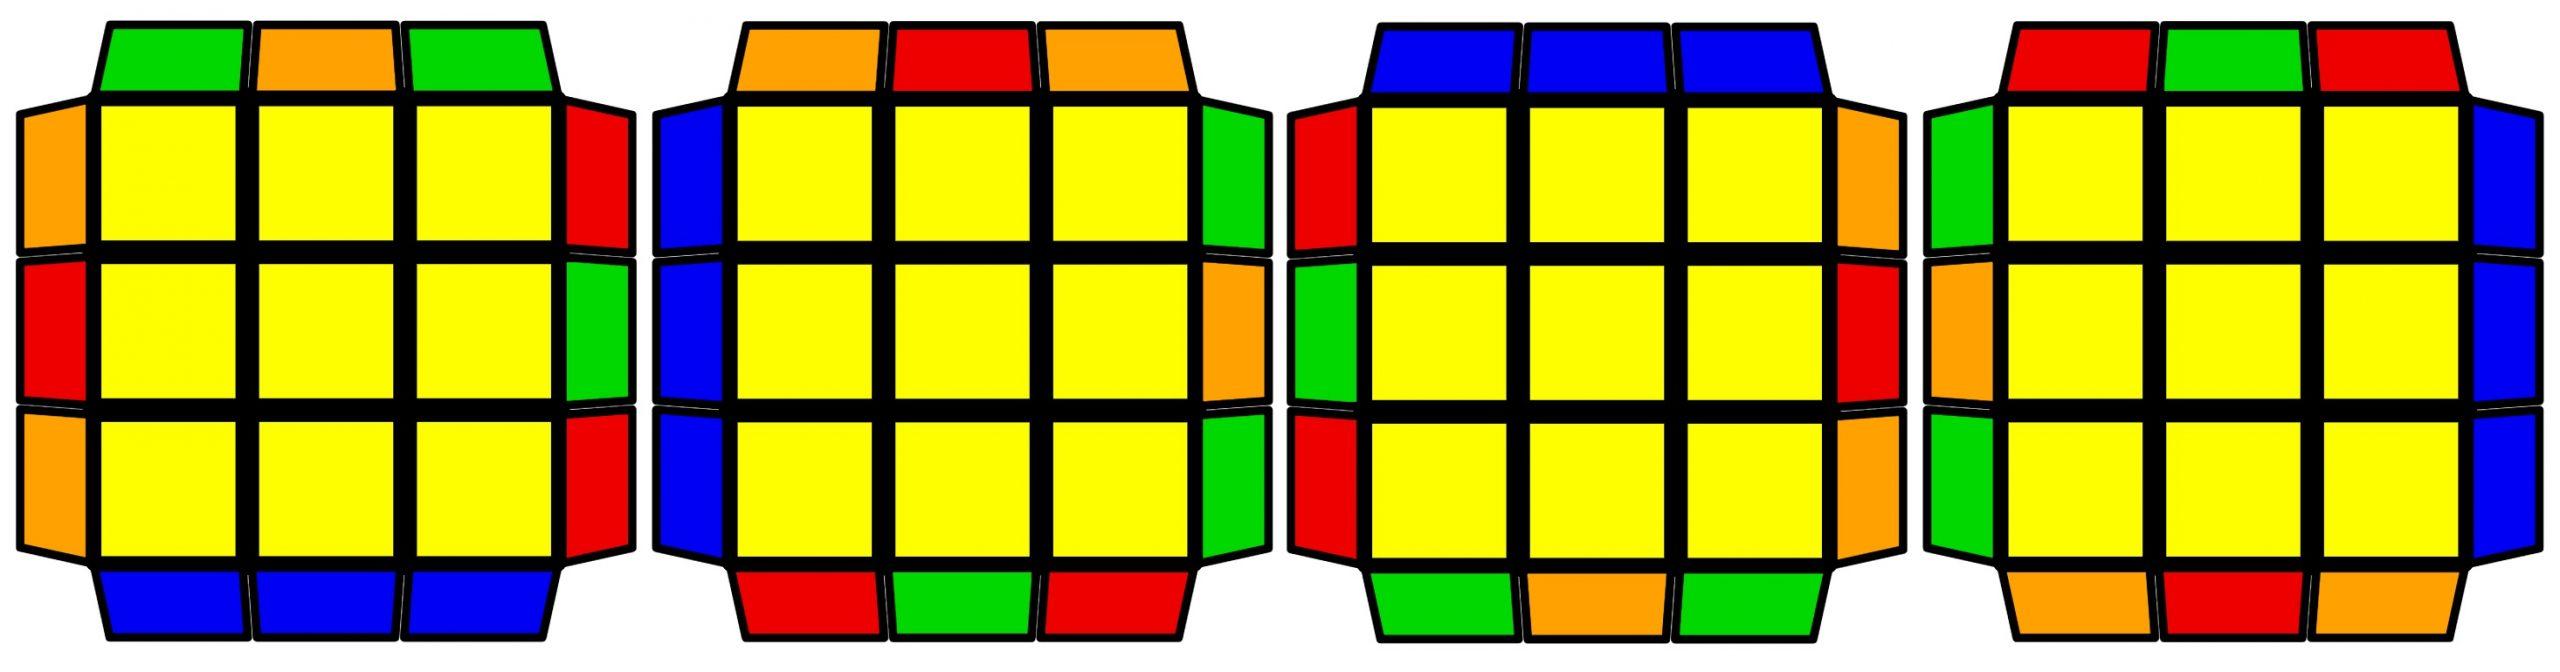 Algoritmos de outro ângulo